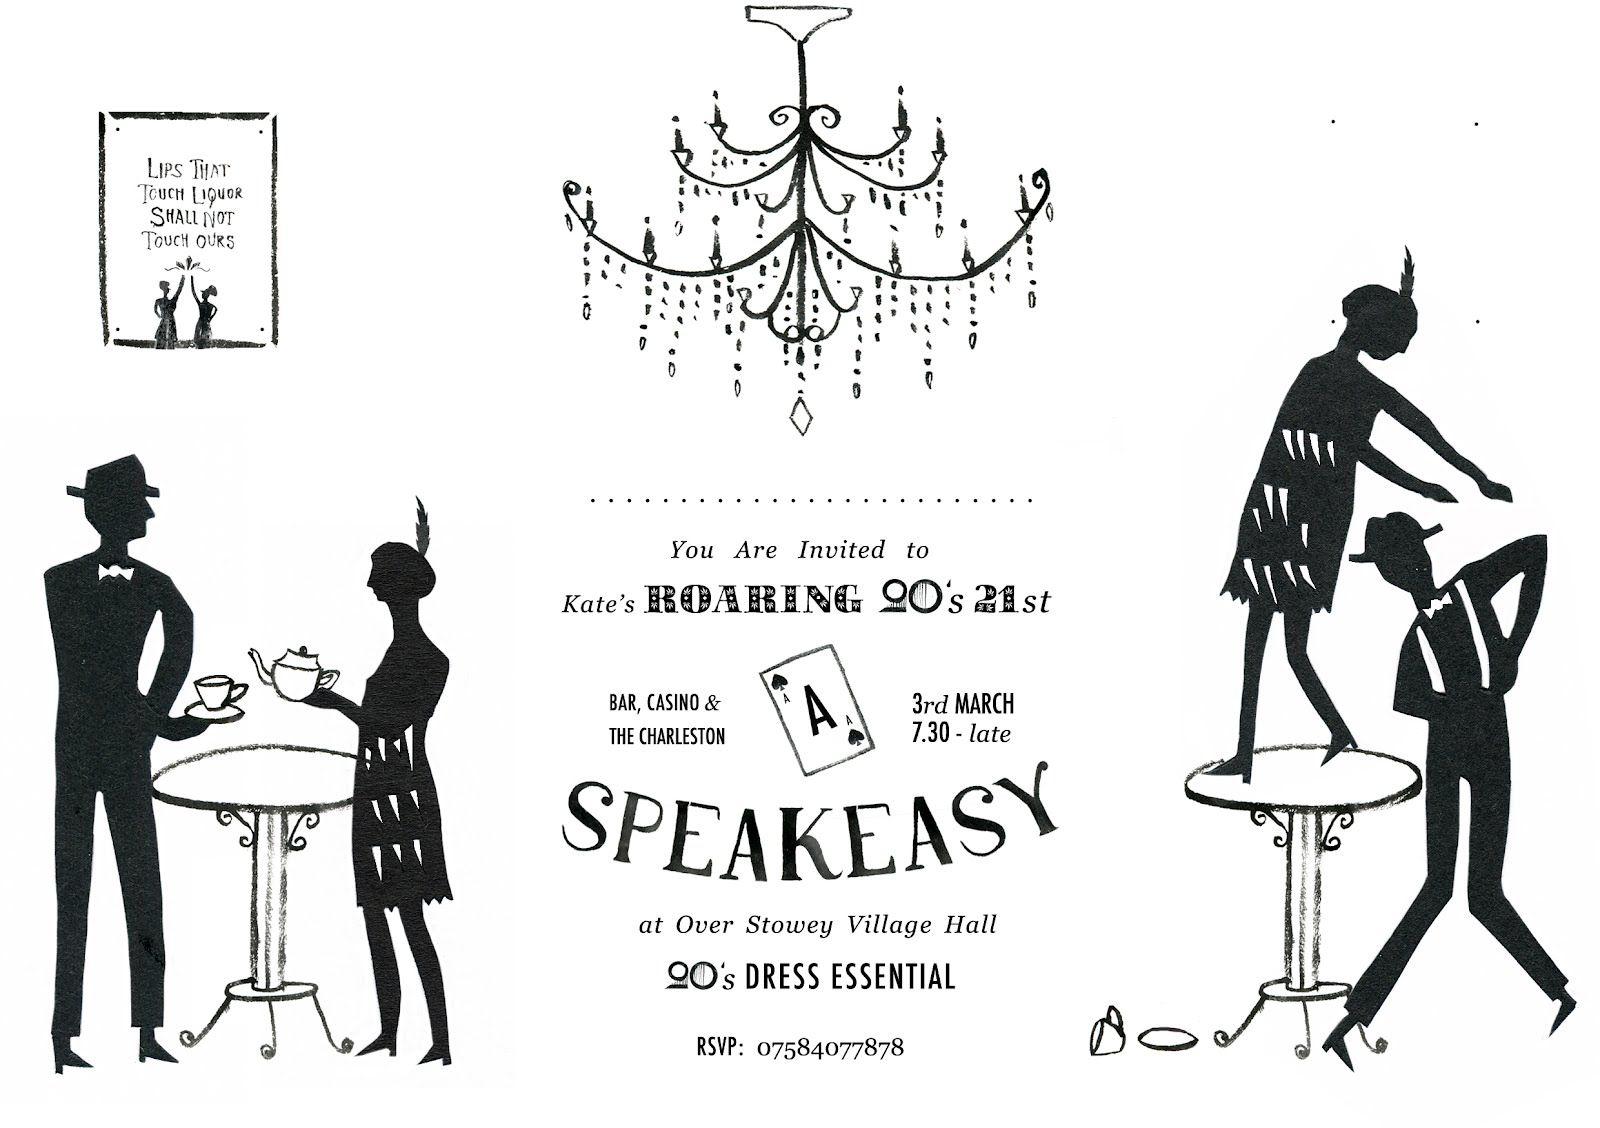 roaring twenties party ideas | ... Party http://hannahrbailey ...